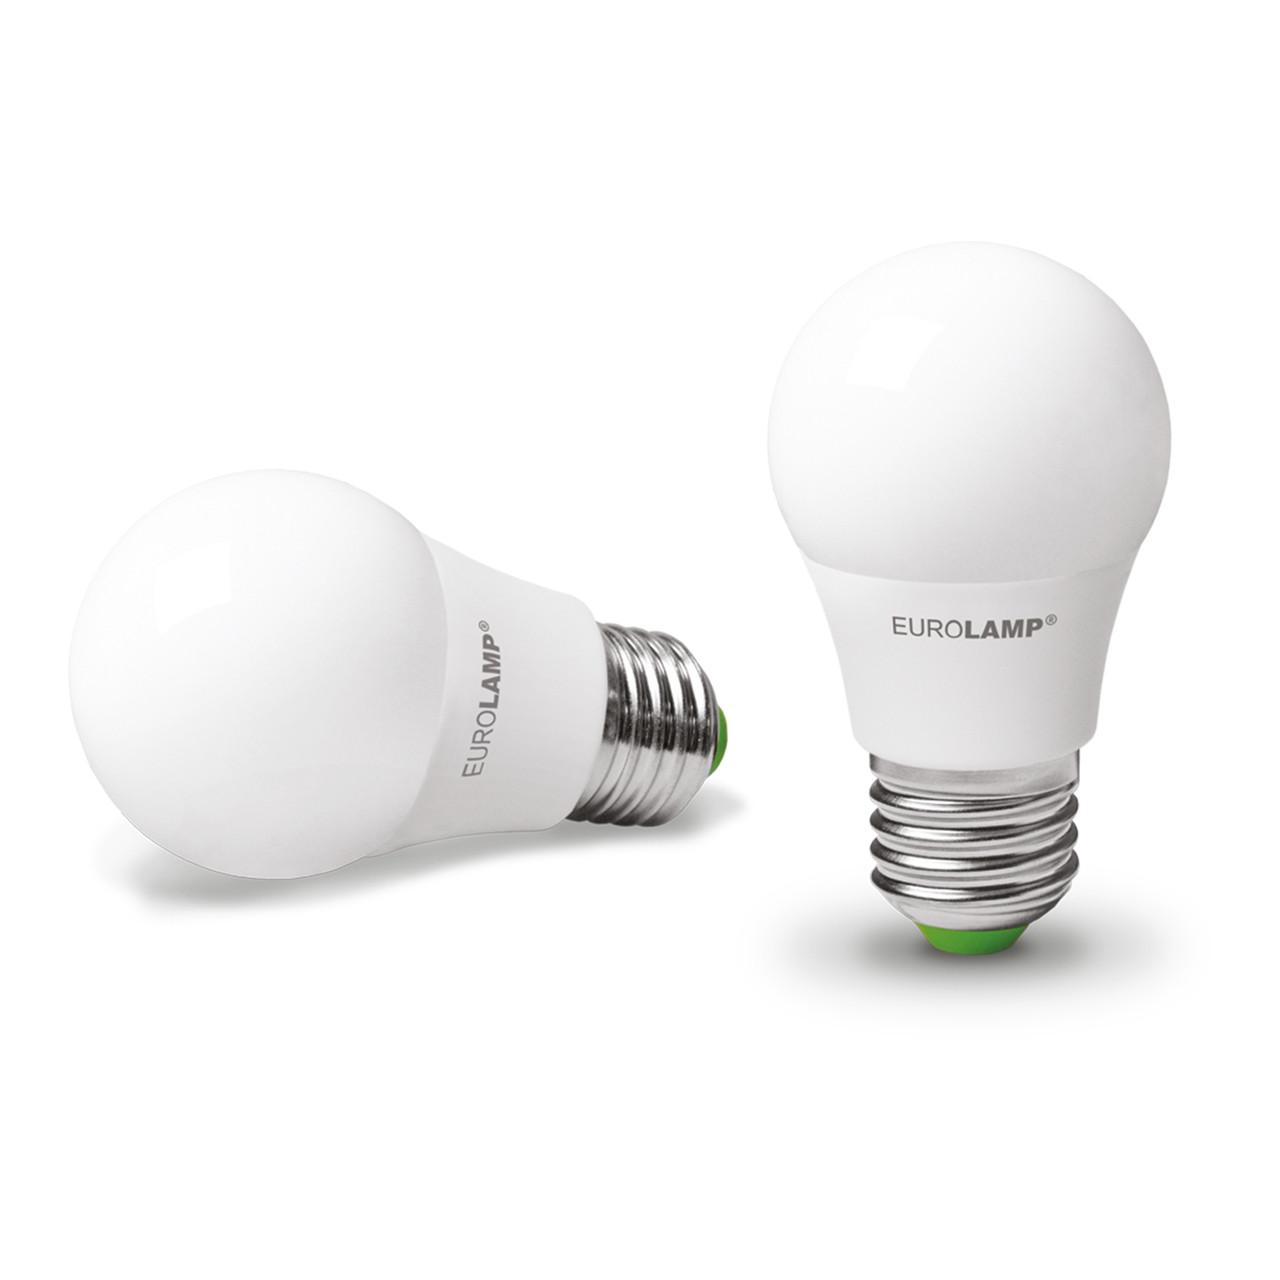 EUROLAMP LED Лампа EKO A50 7W E27 3000K, фото 1